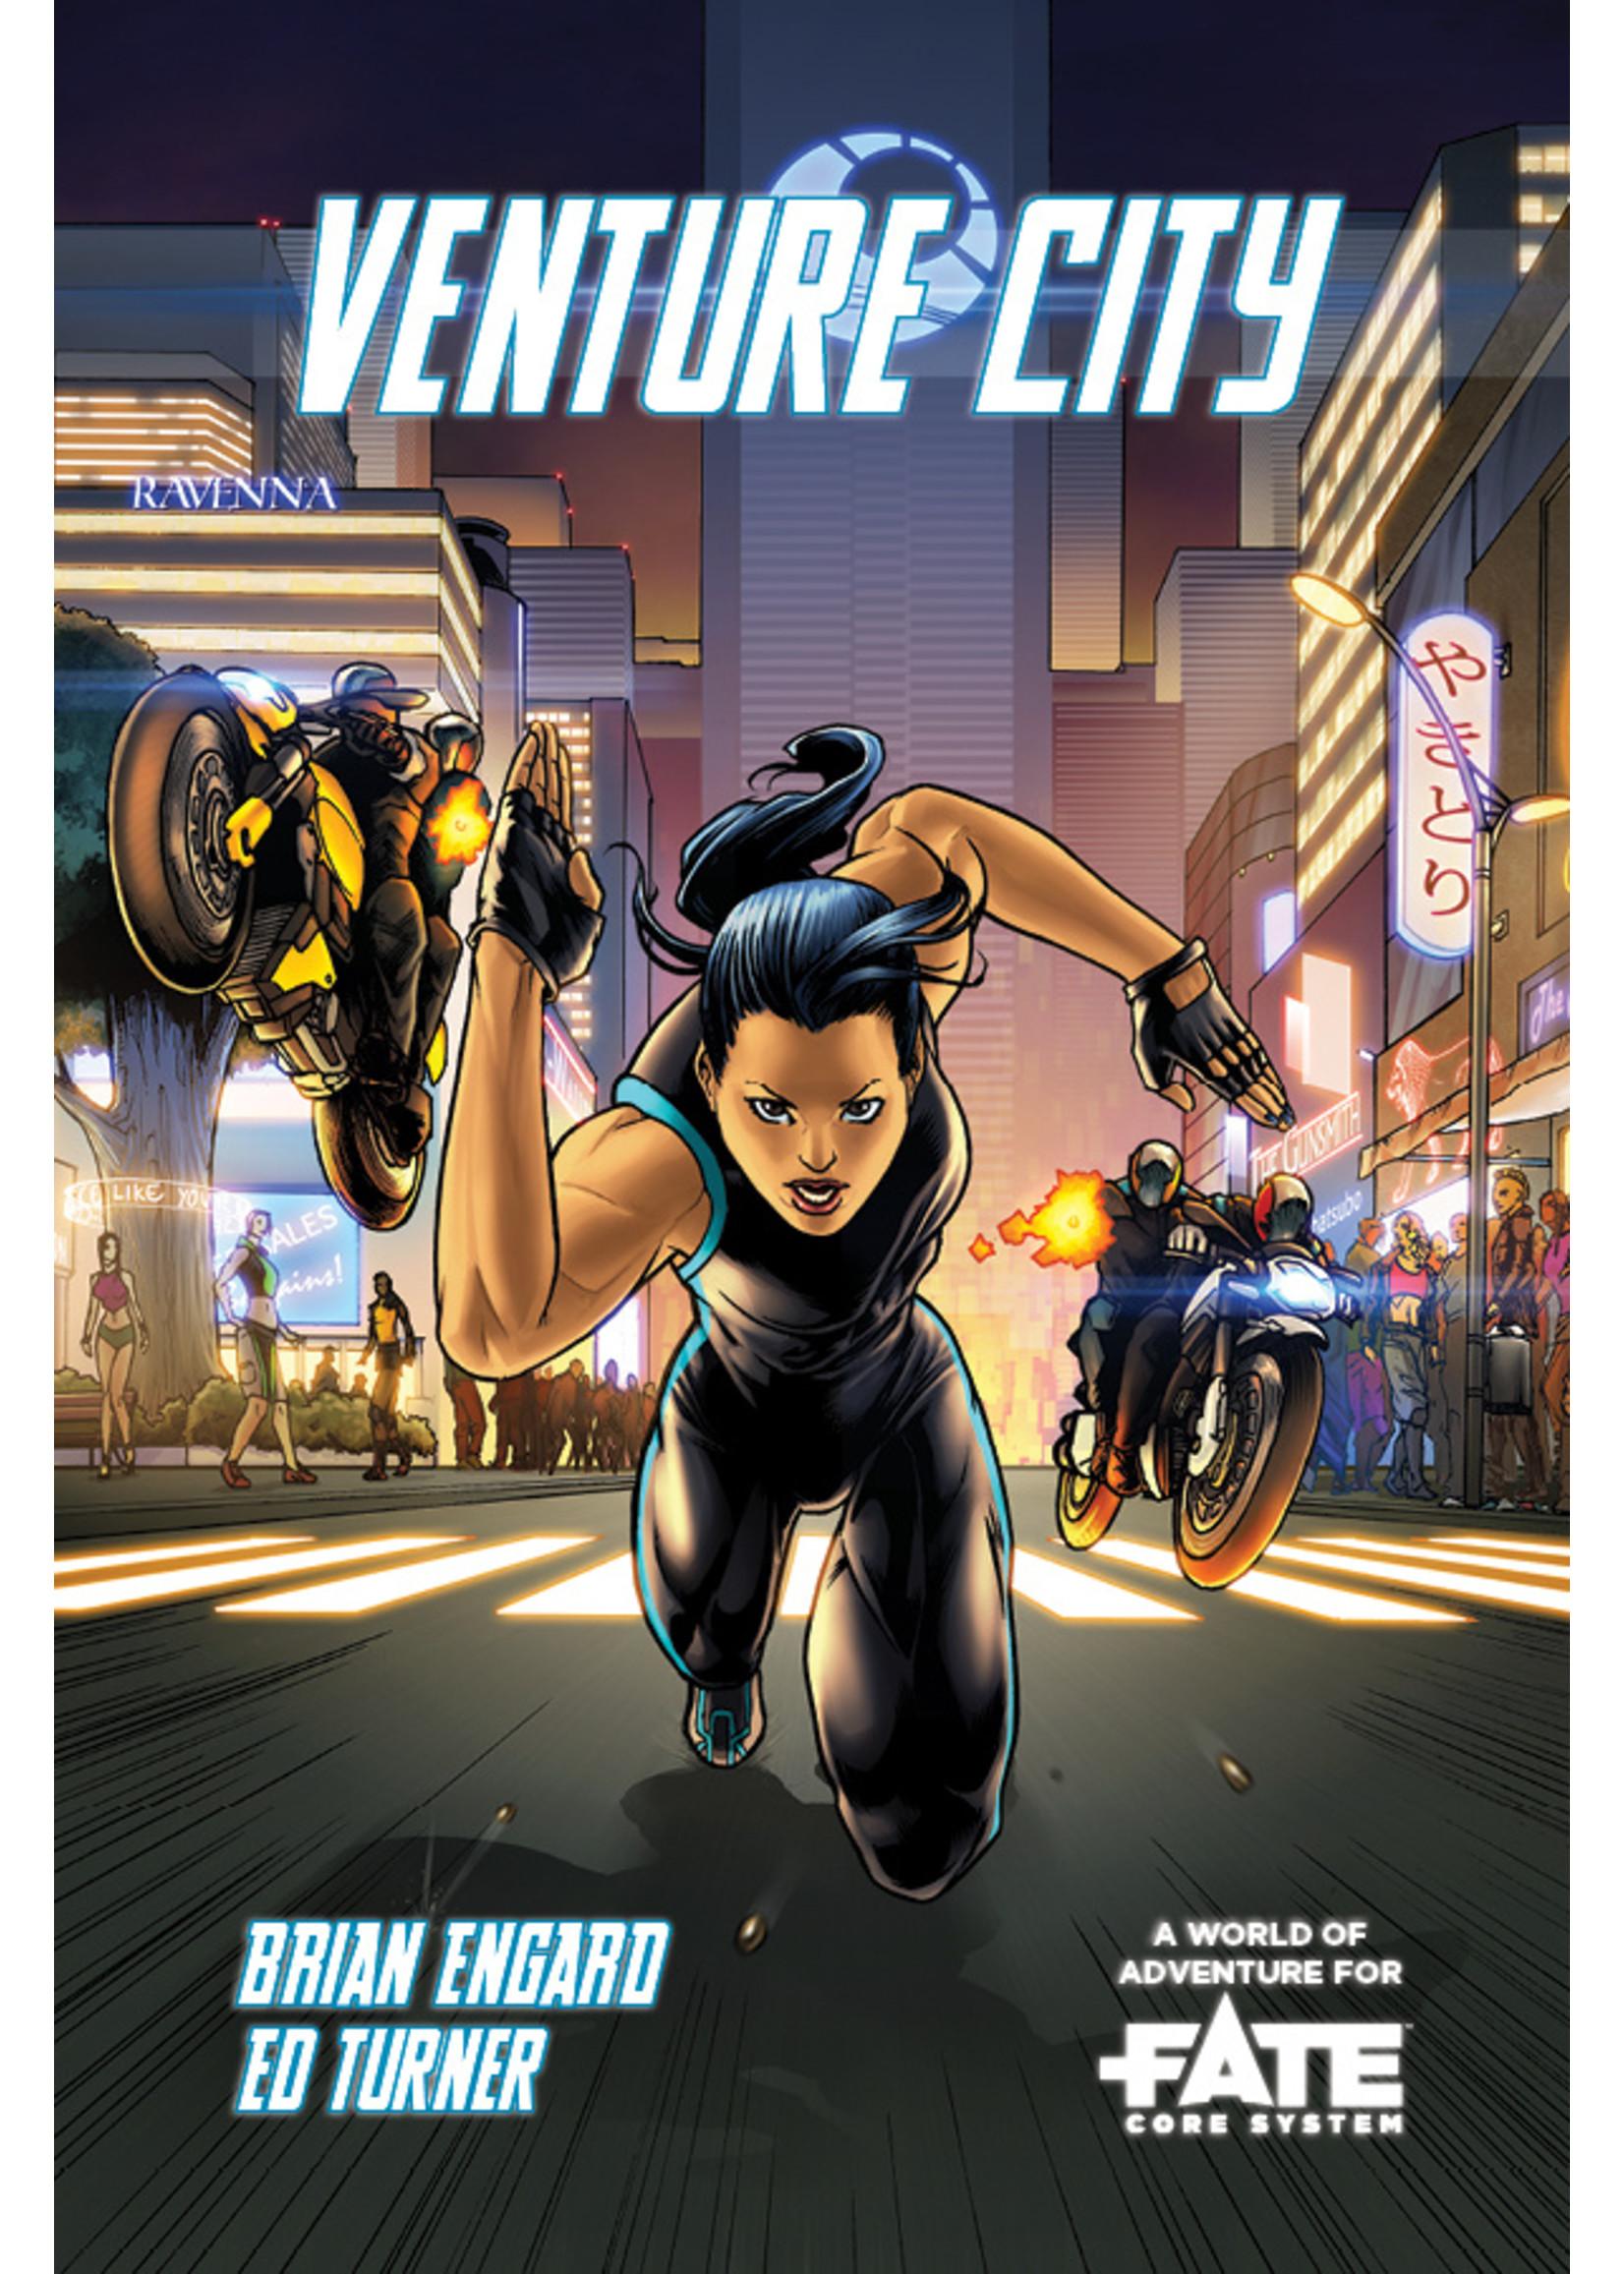 Fate Core: Venture City